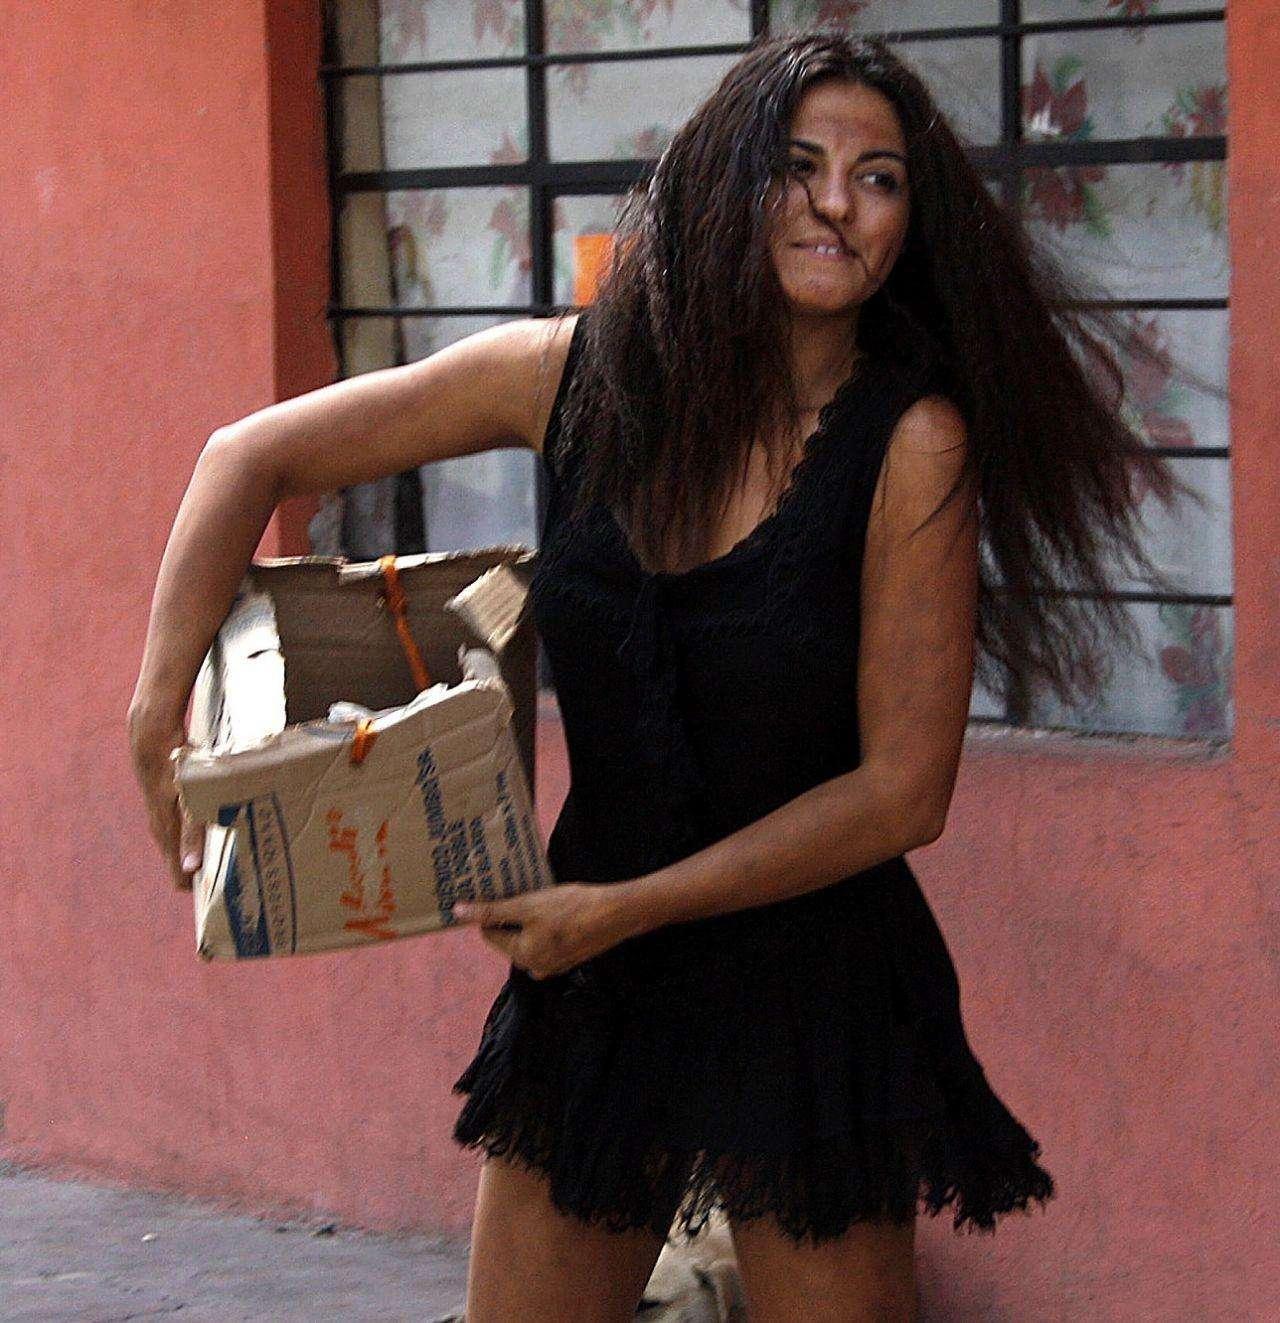 Maite Perroni se mudará a Estados Unidos Foto: Agencia Mezcalent